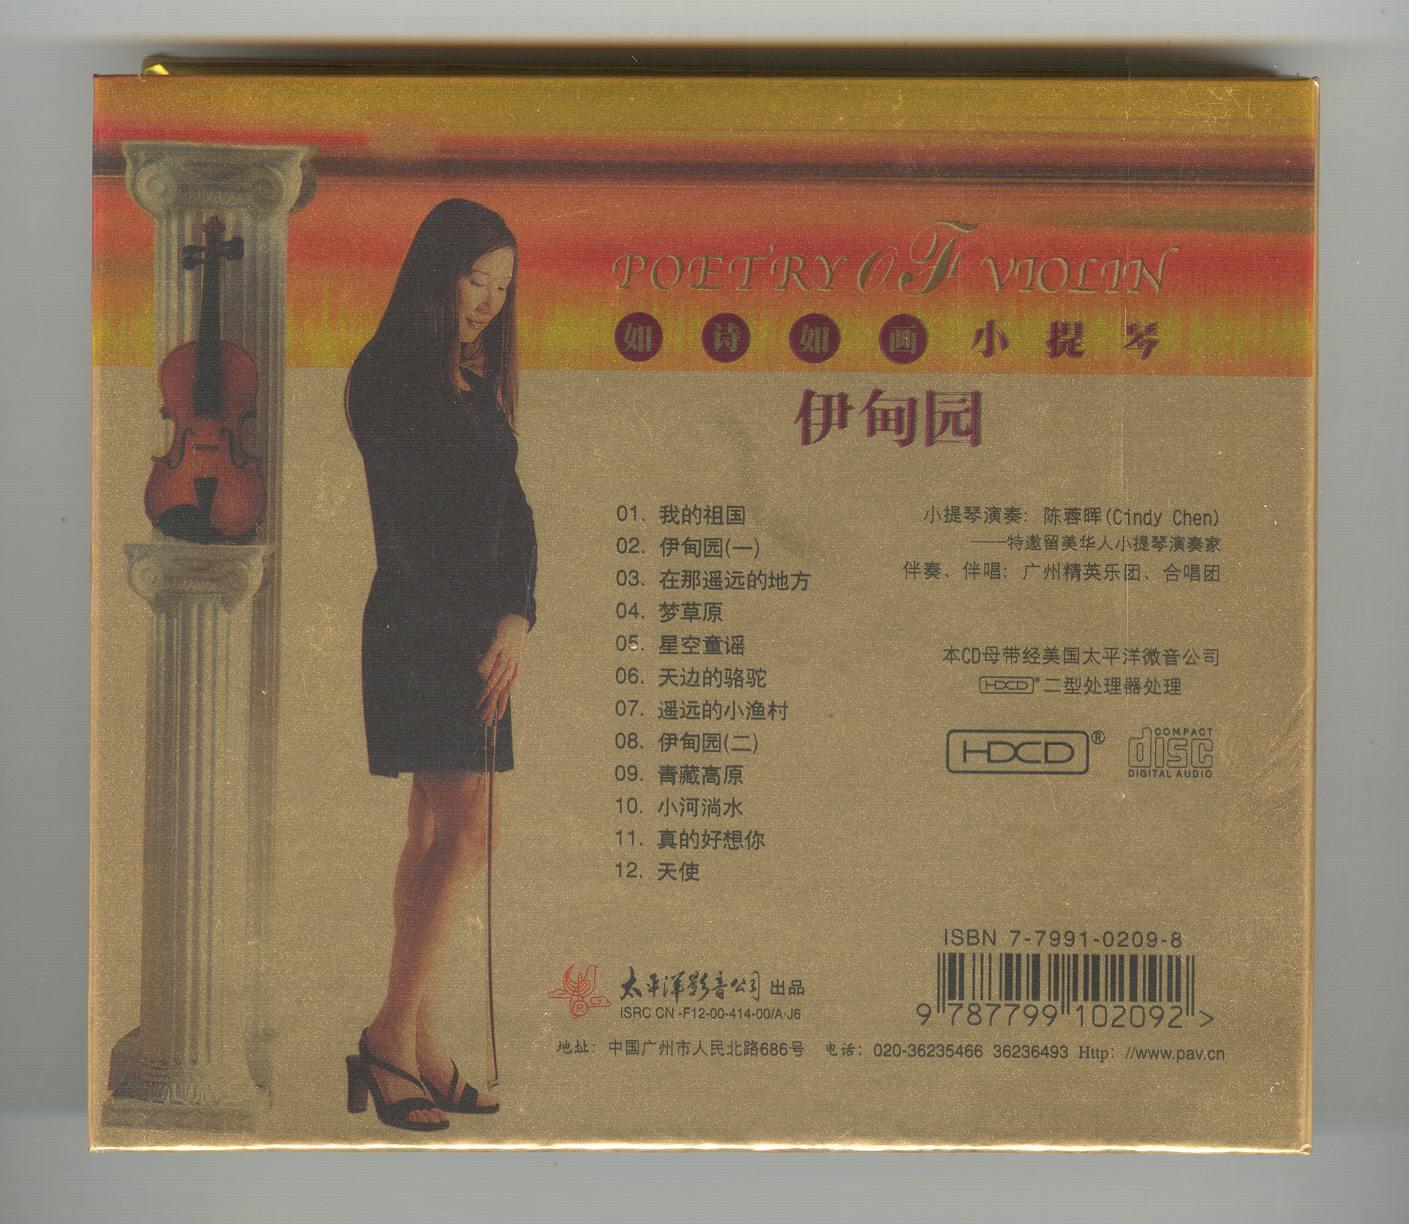 陈蓉晖如诗如画小提琴